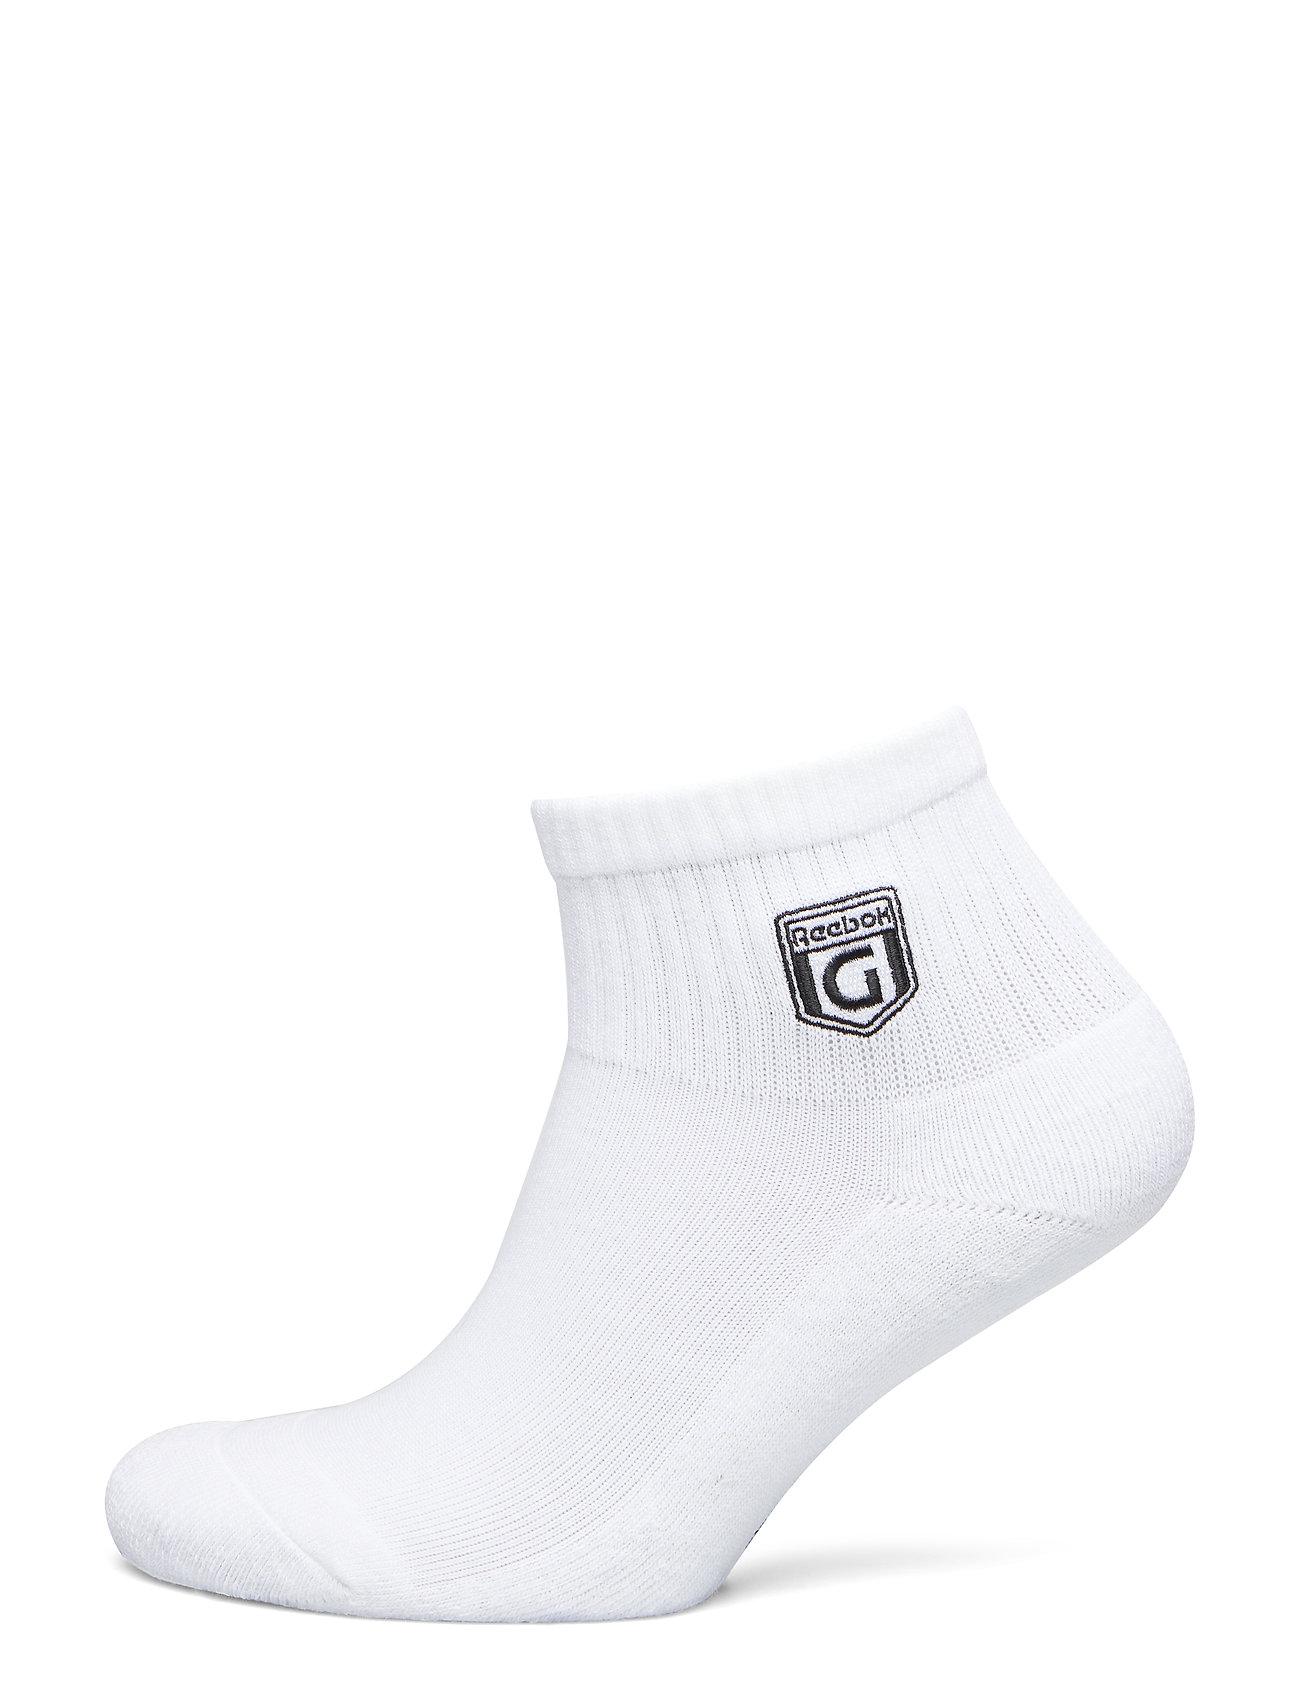 Reebok Classics CL Gigi Hadid Ankle socks - WHITE